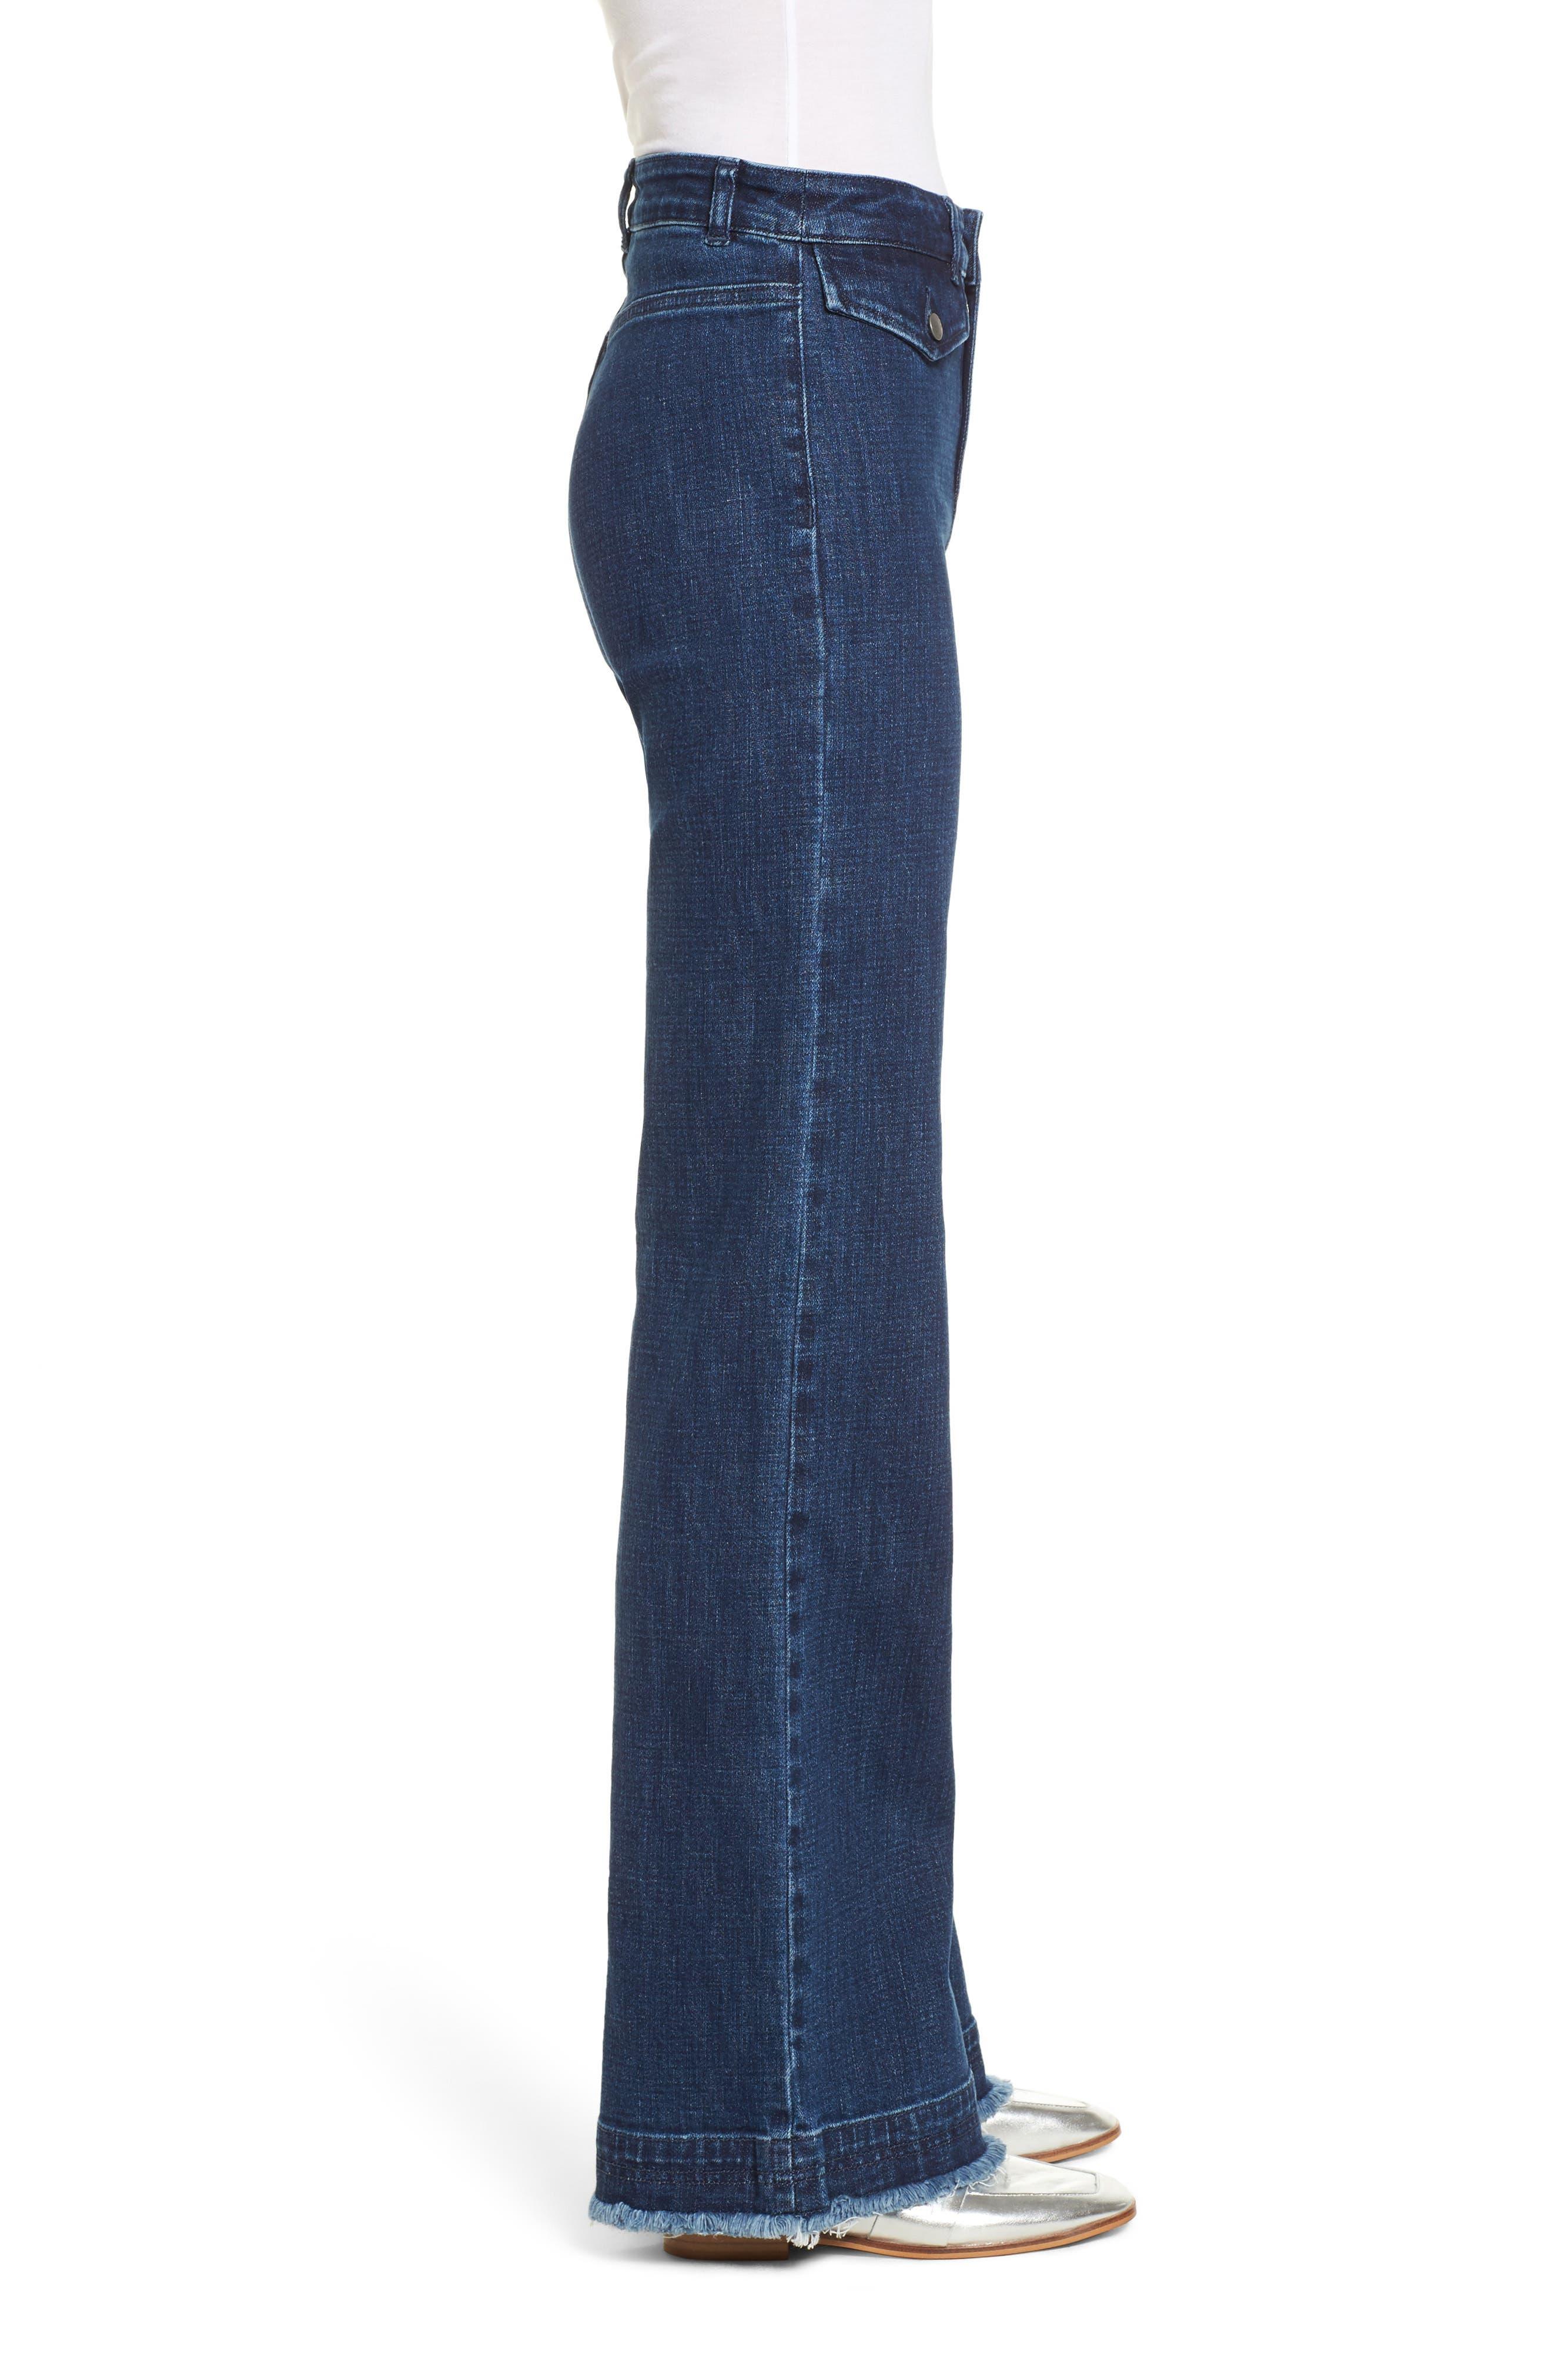 Elwood Wide Leg Jeans,                             Alternate thumbnail 3, color,                             INDIGO